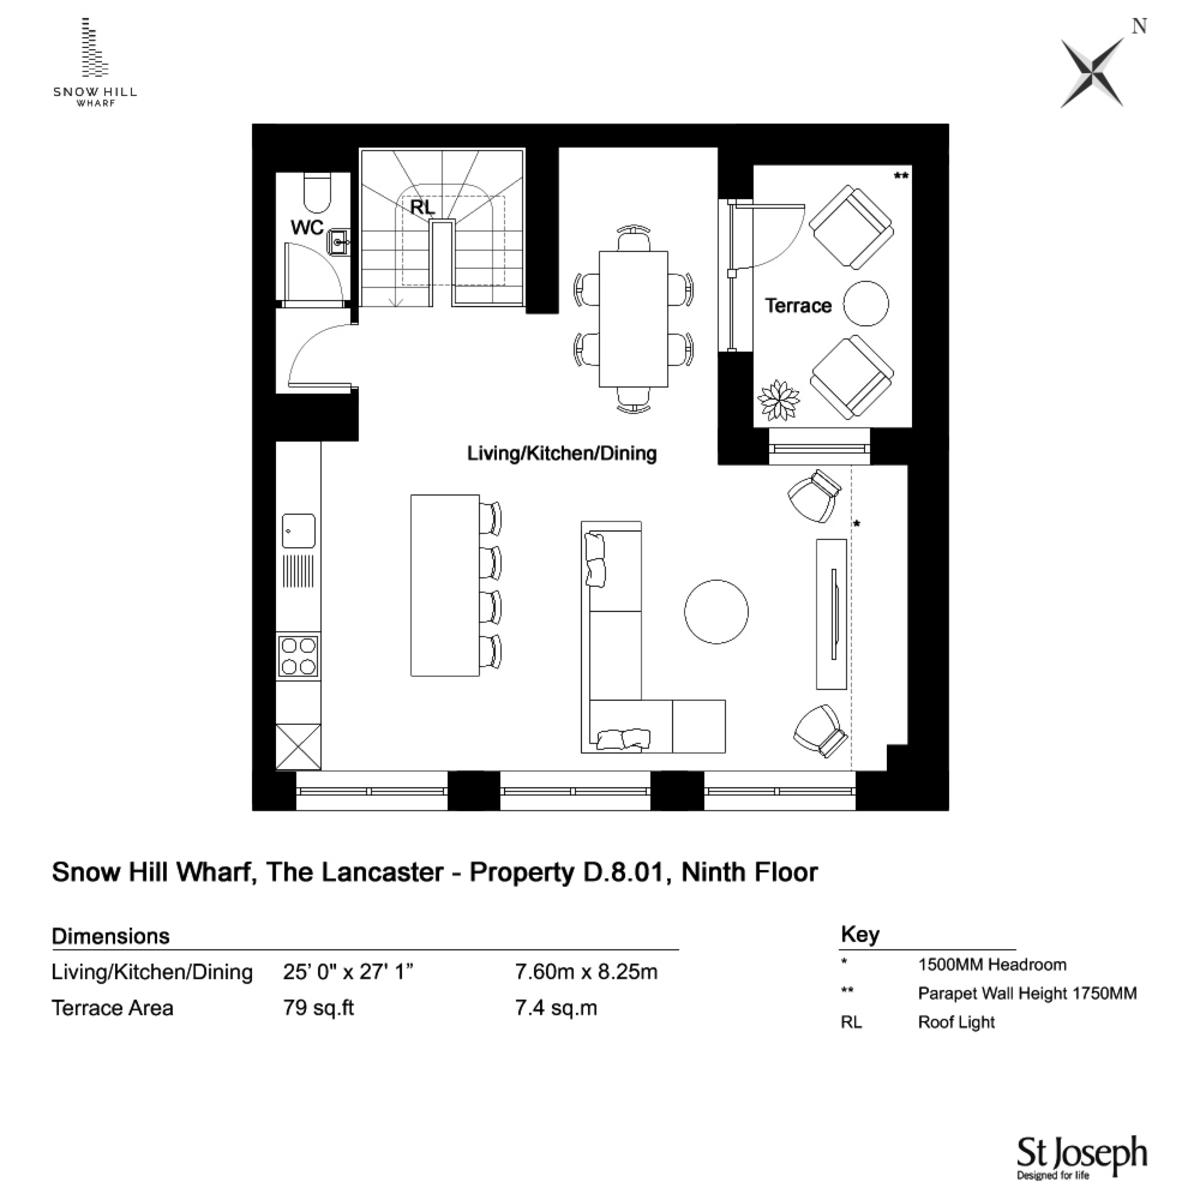 Snow Hill Wharf, Birmingham City Centre floorplan 1 of 3